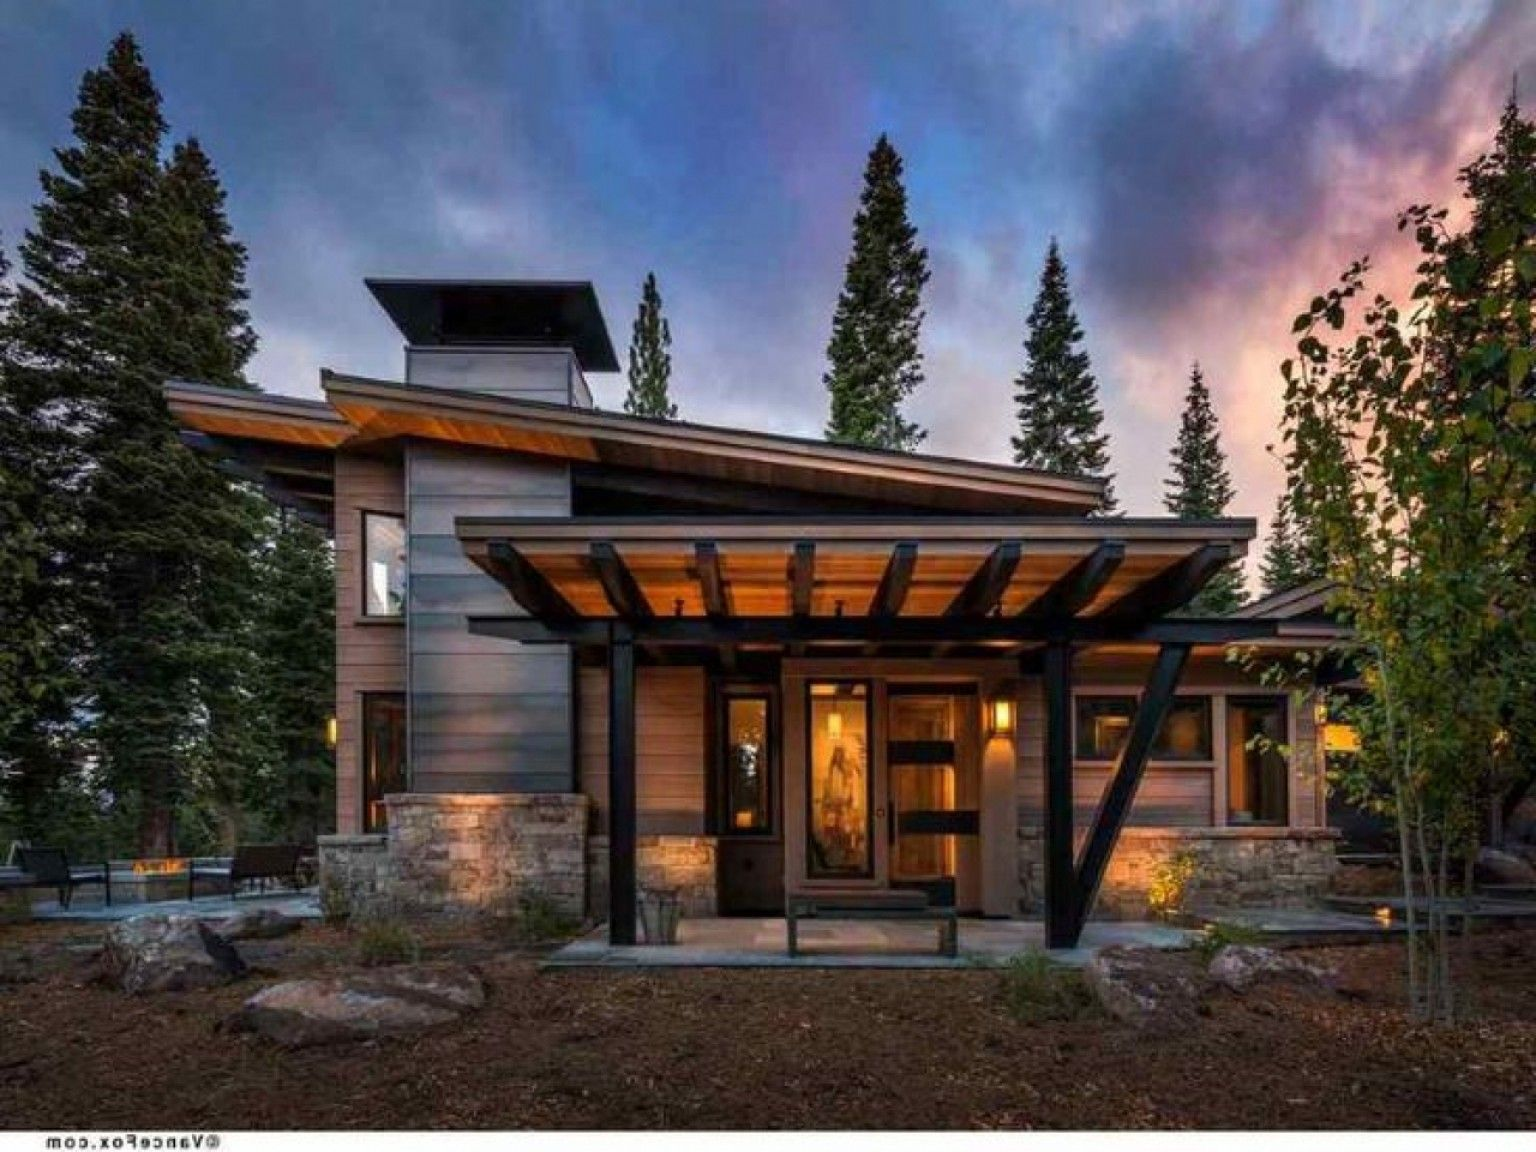 Modern Mountain Home Designs: Appalachian Mountain House